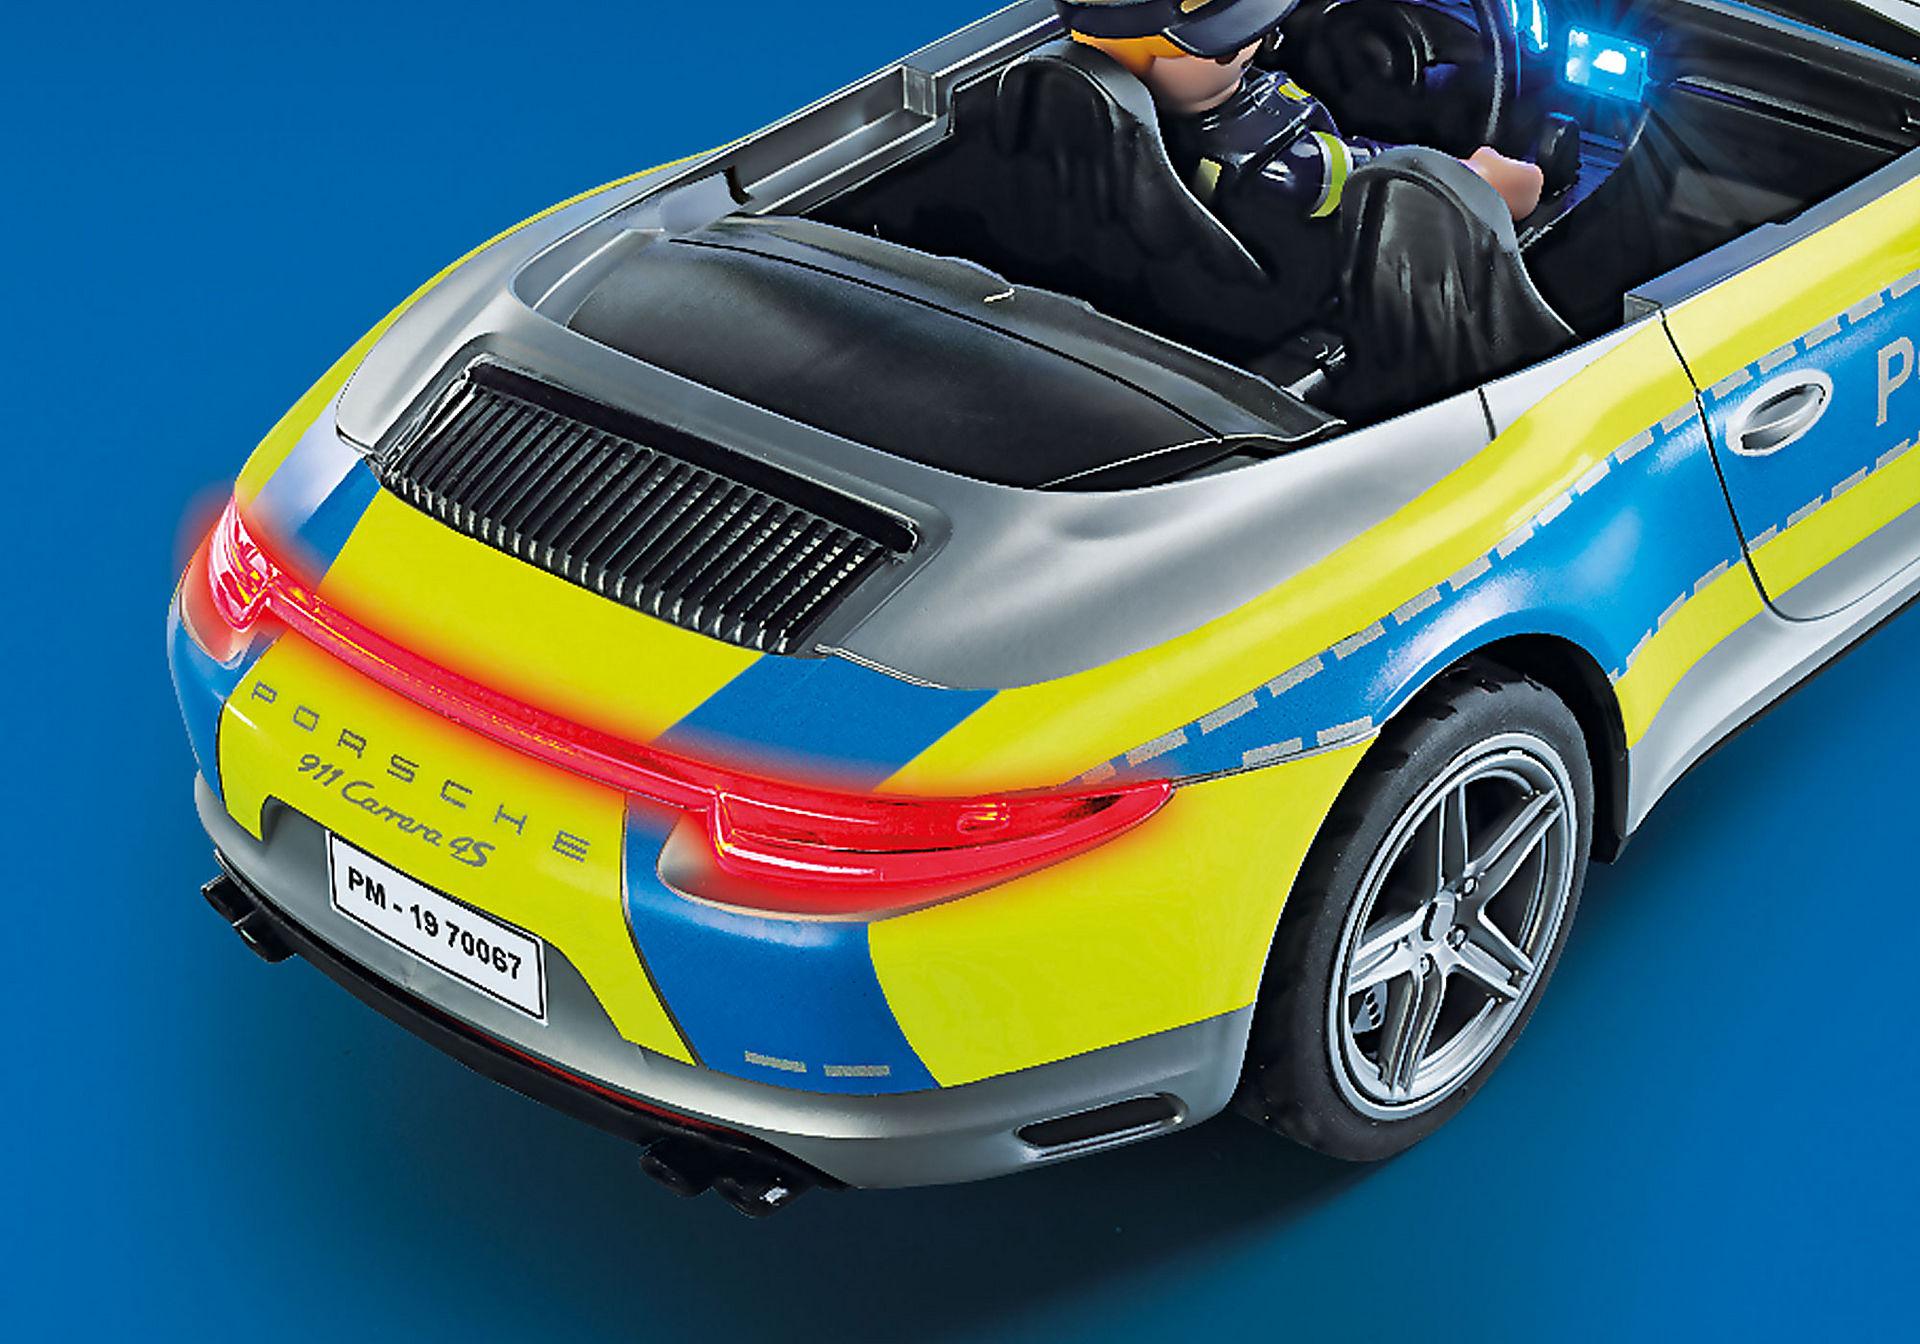 70067 Porsche 911 Carrera 4S Police zoom image6